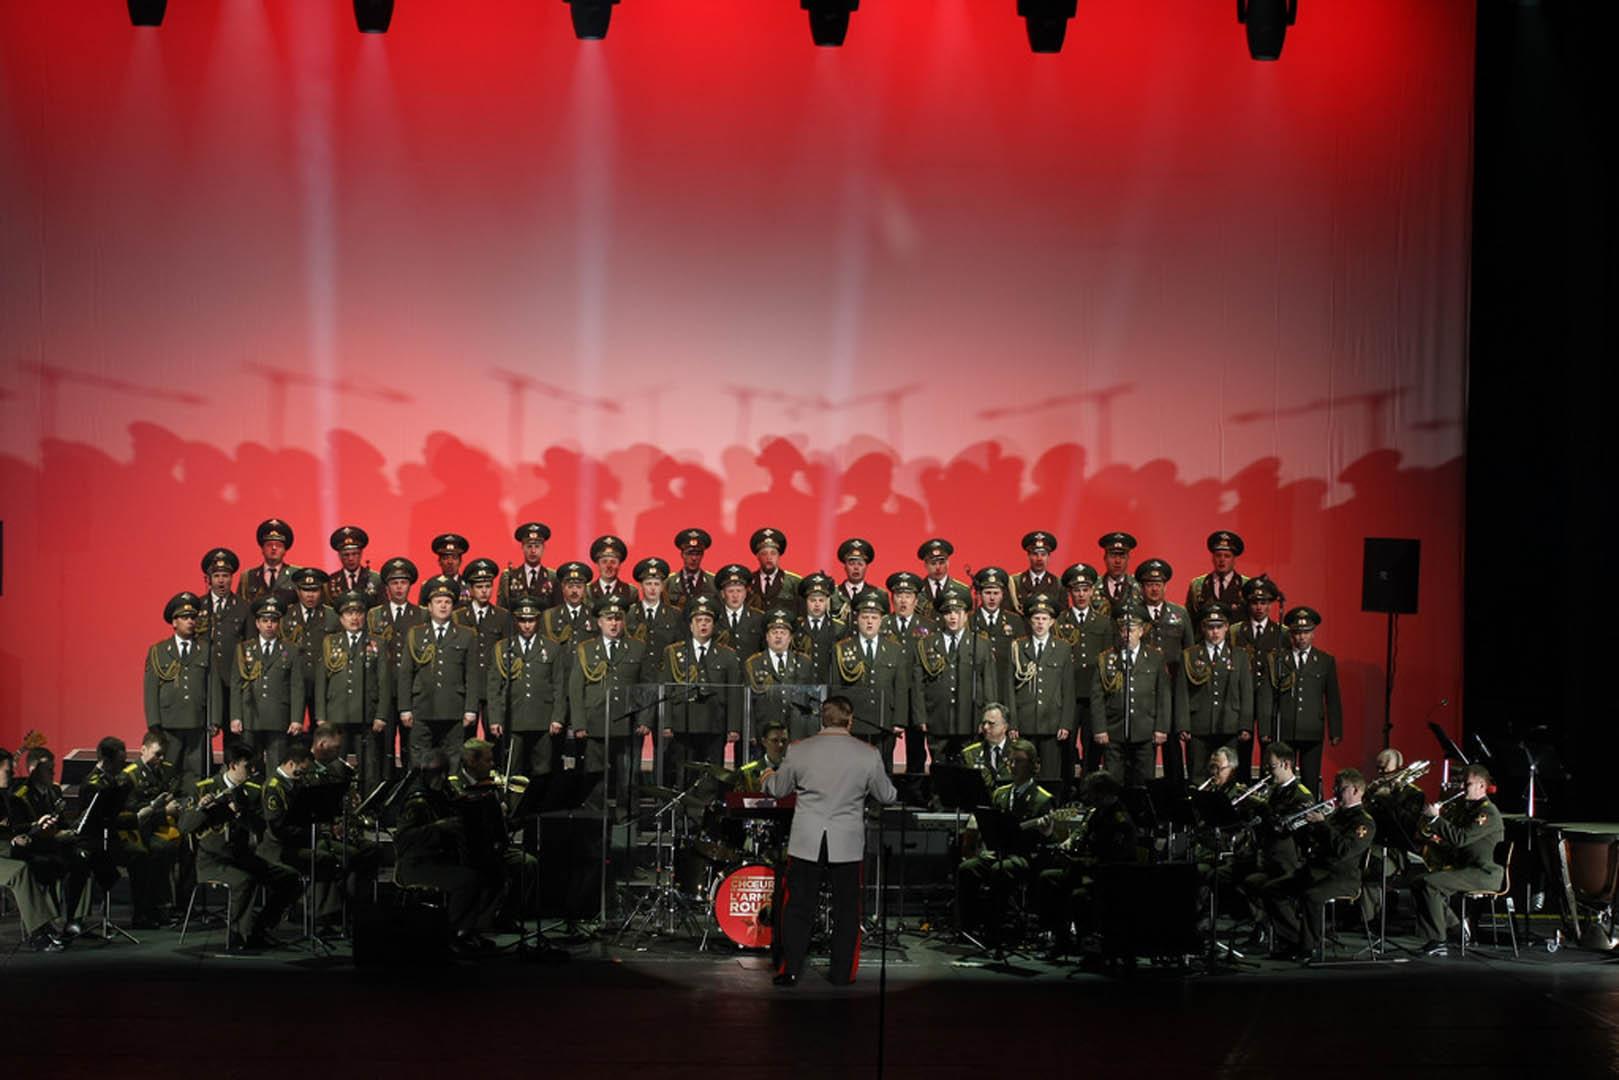 2013.03.20-CHOEURS ARMEE ROUGE-ARENA-GENEVE